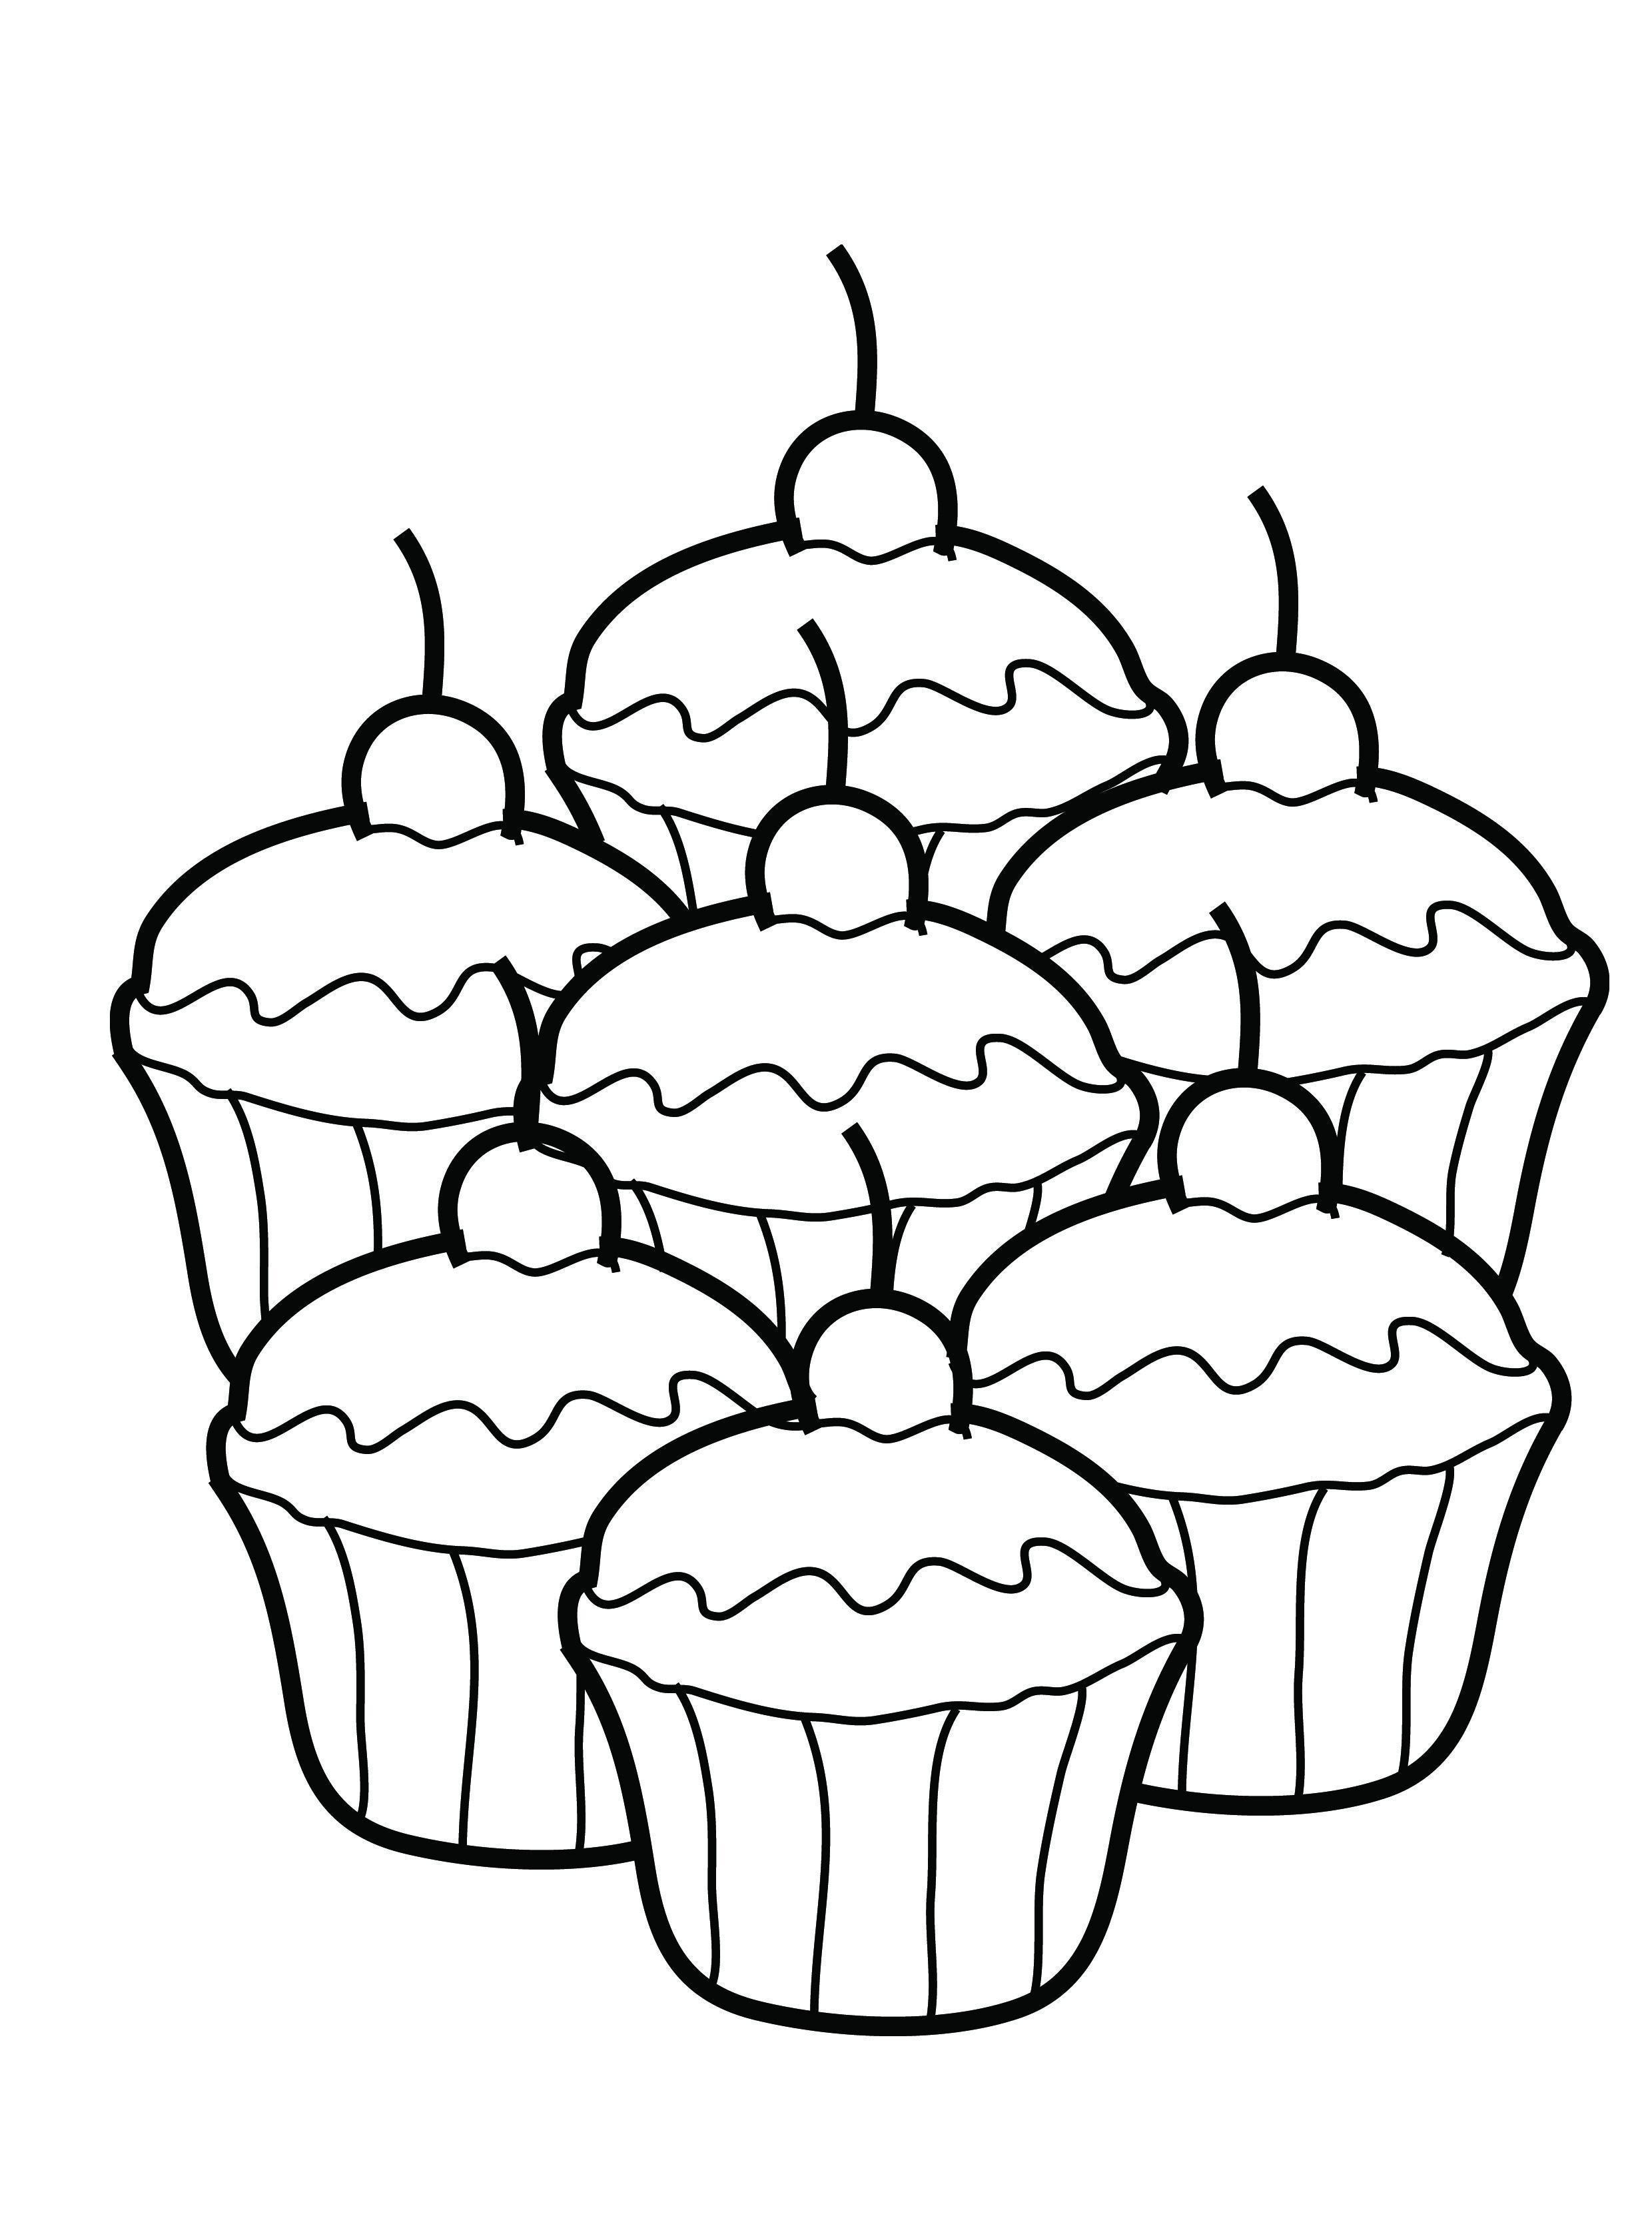 Dessin Cupcake Coloriage  imprimer